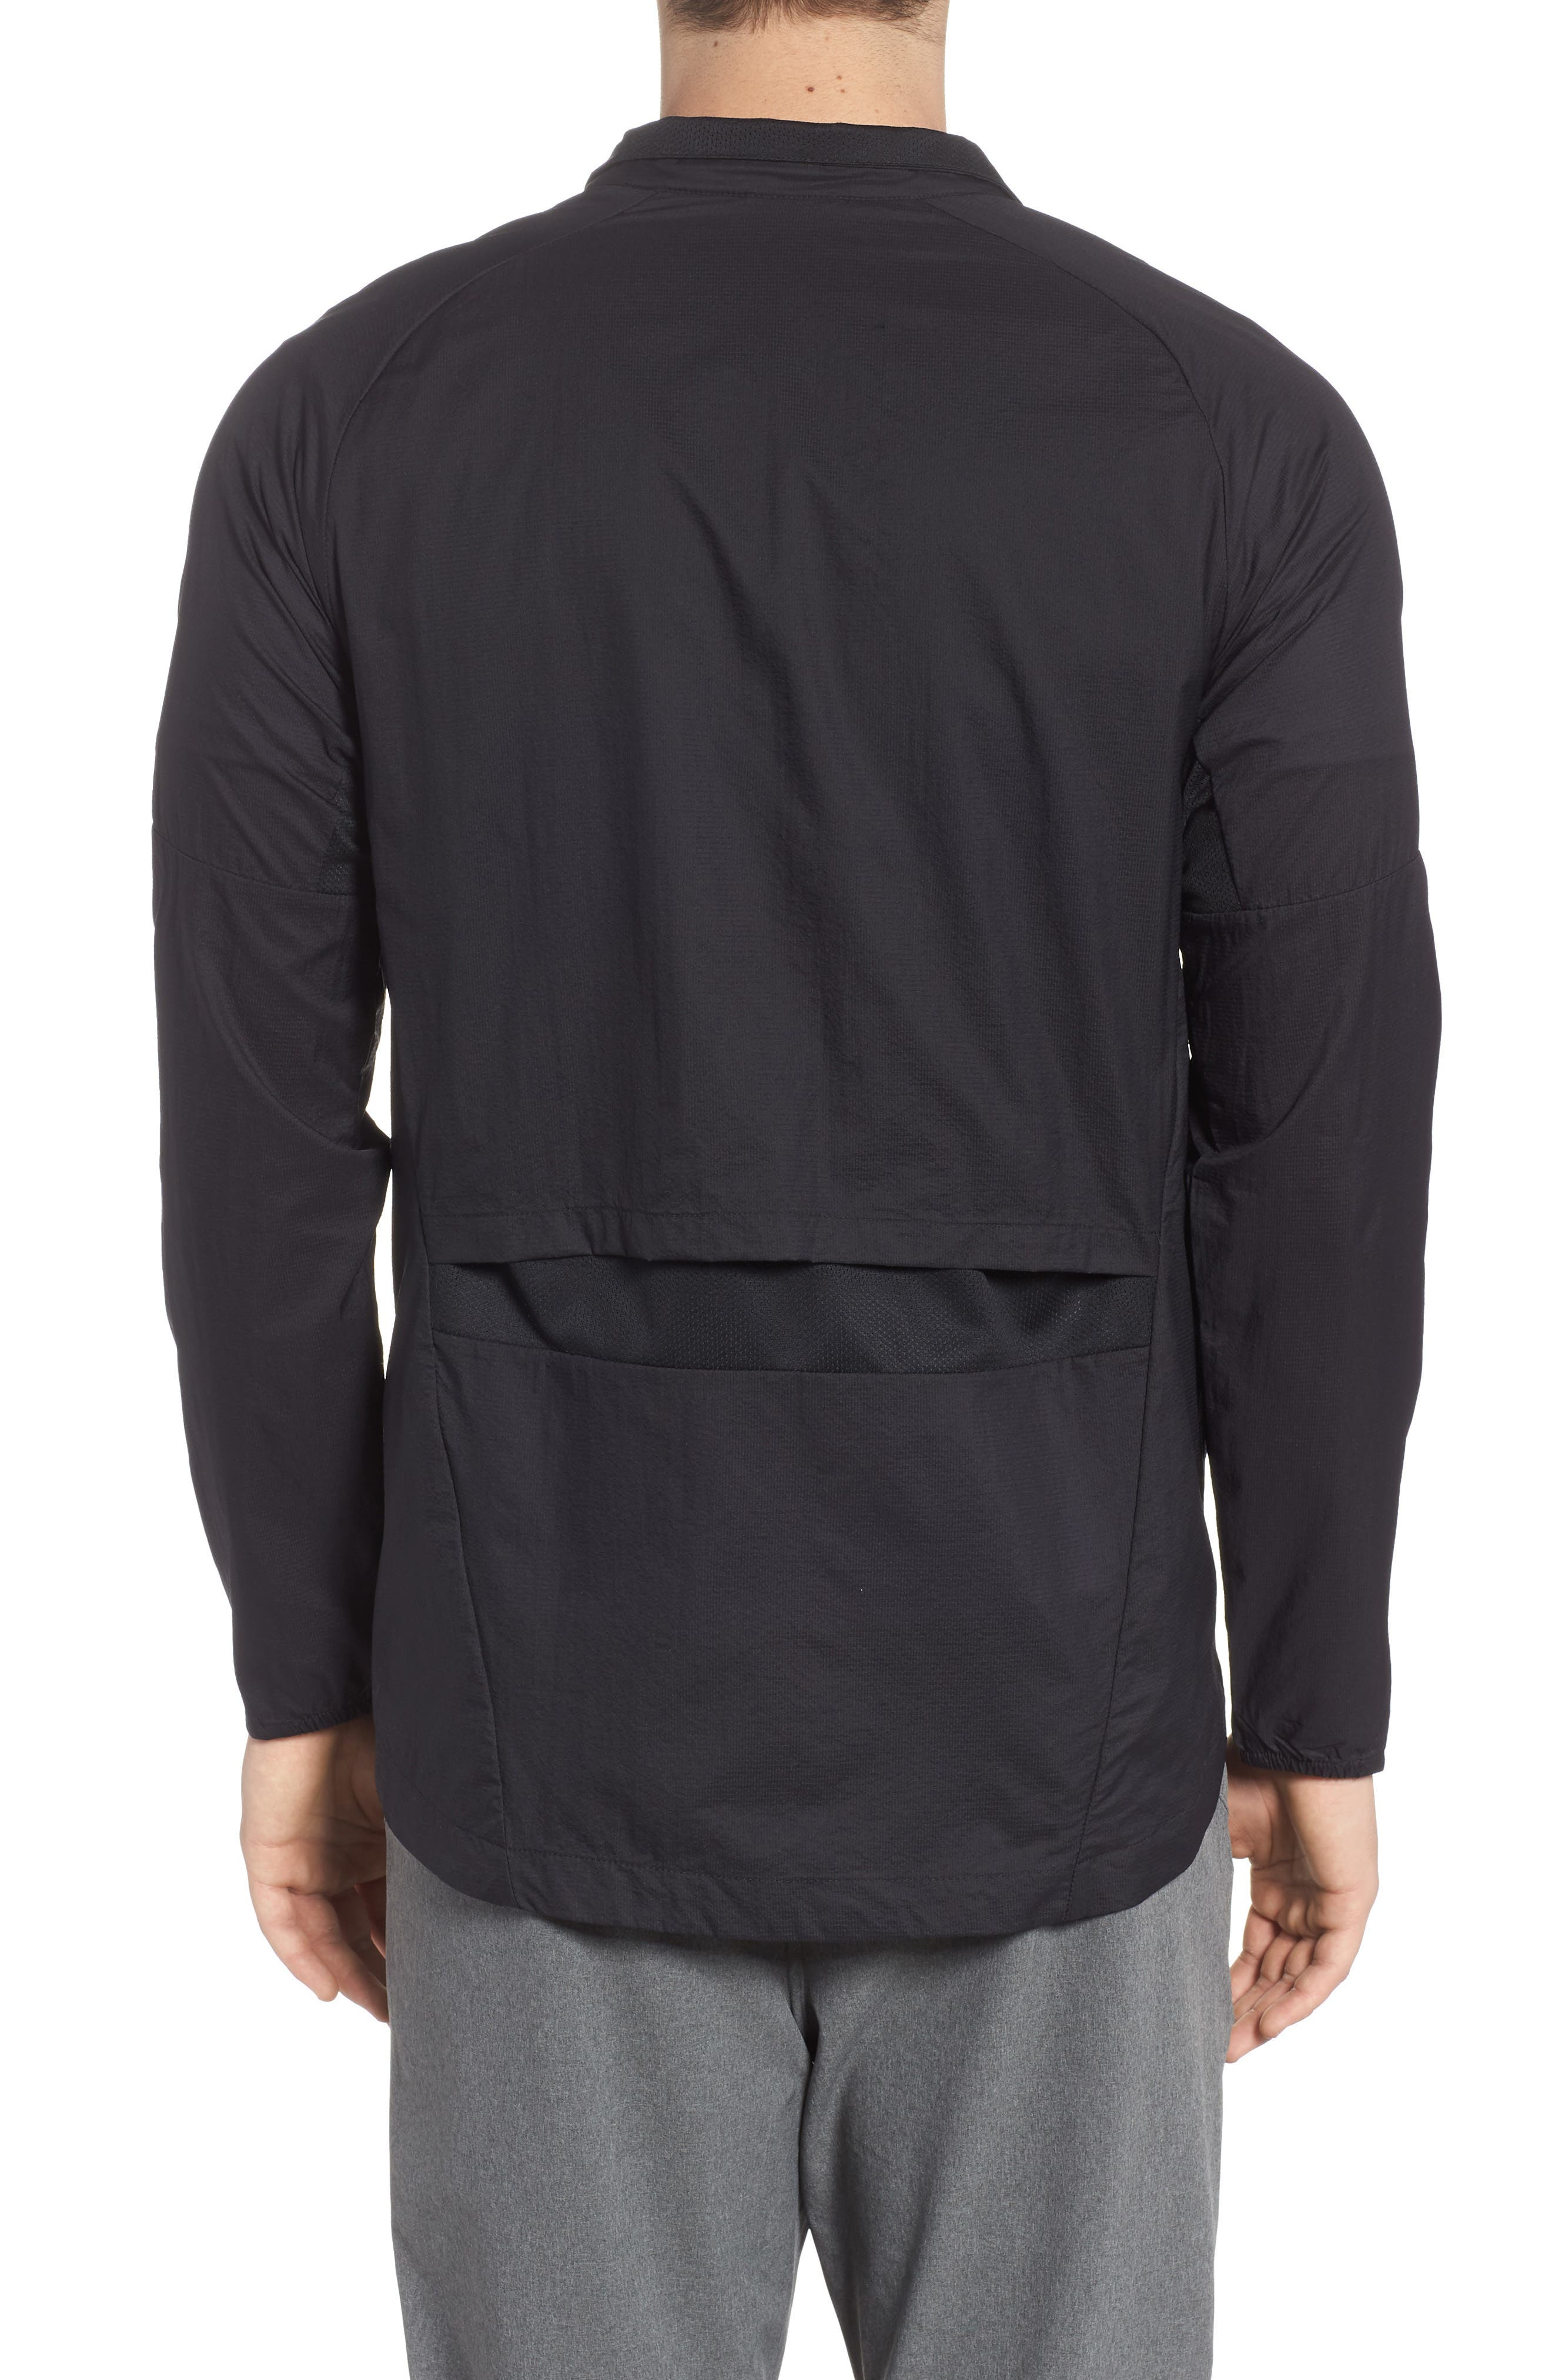 Run Division Jacket,                             Alternate thumbnail 2, color,                             Black